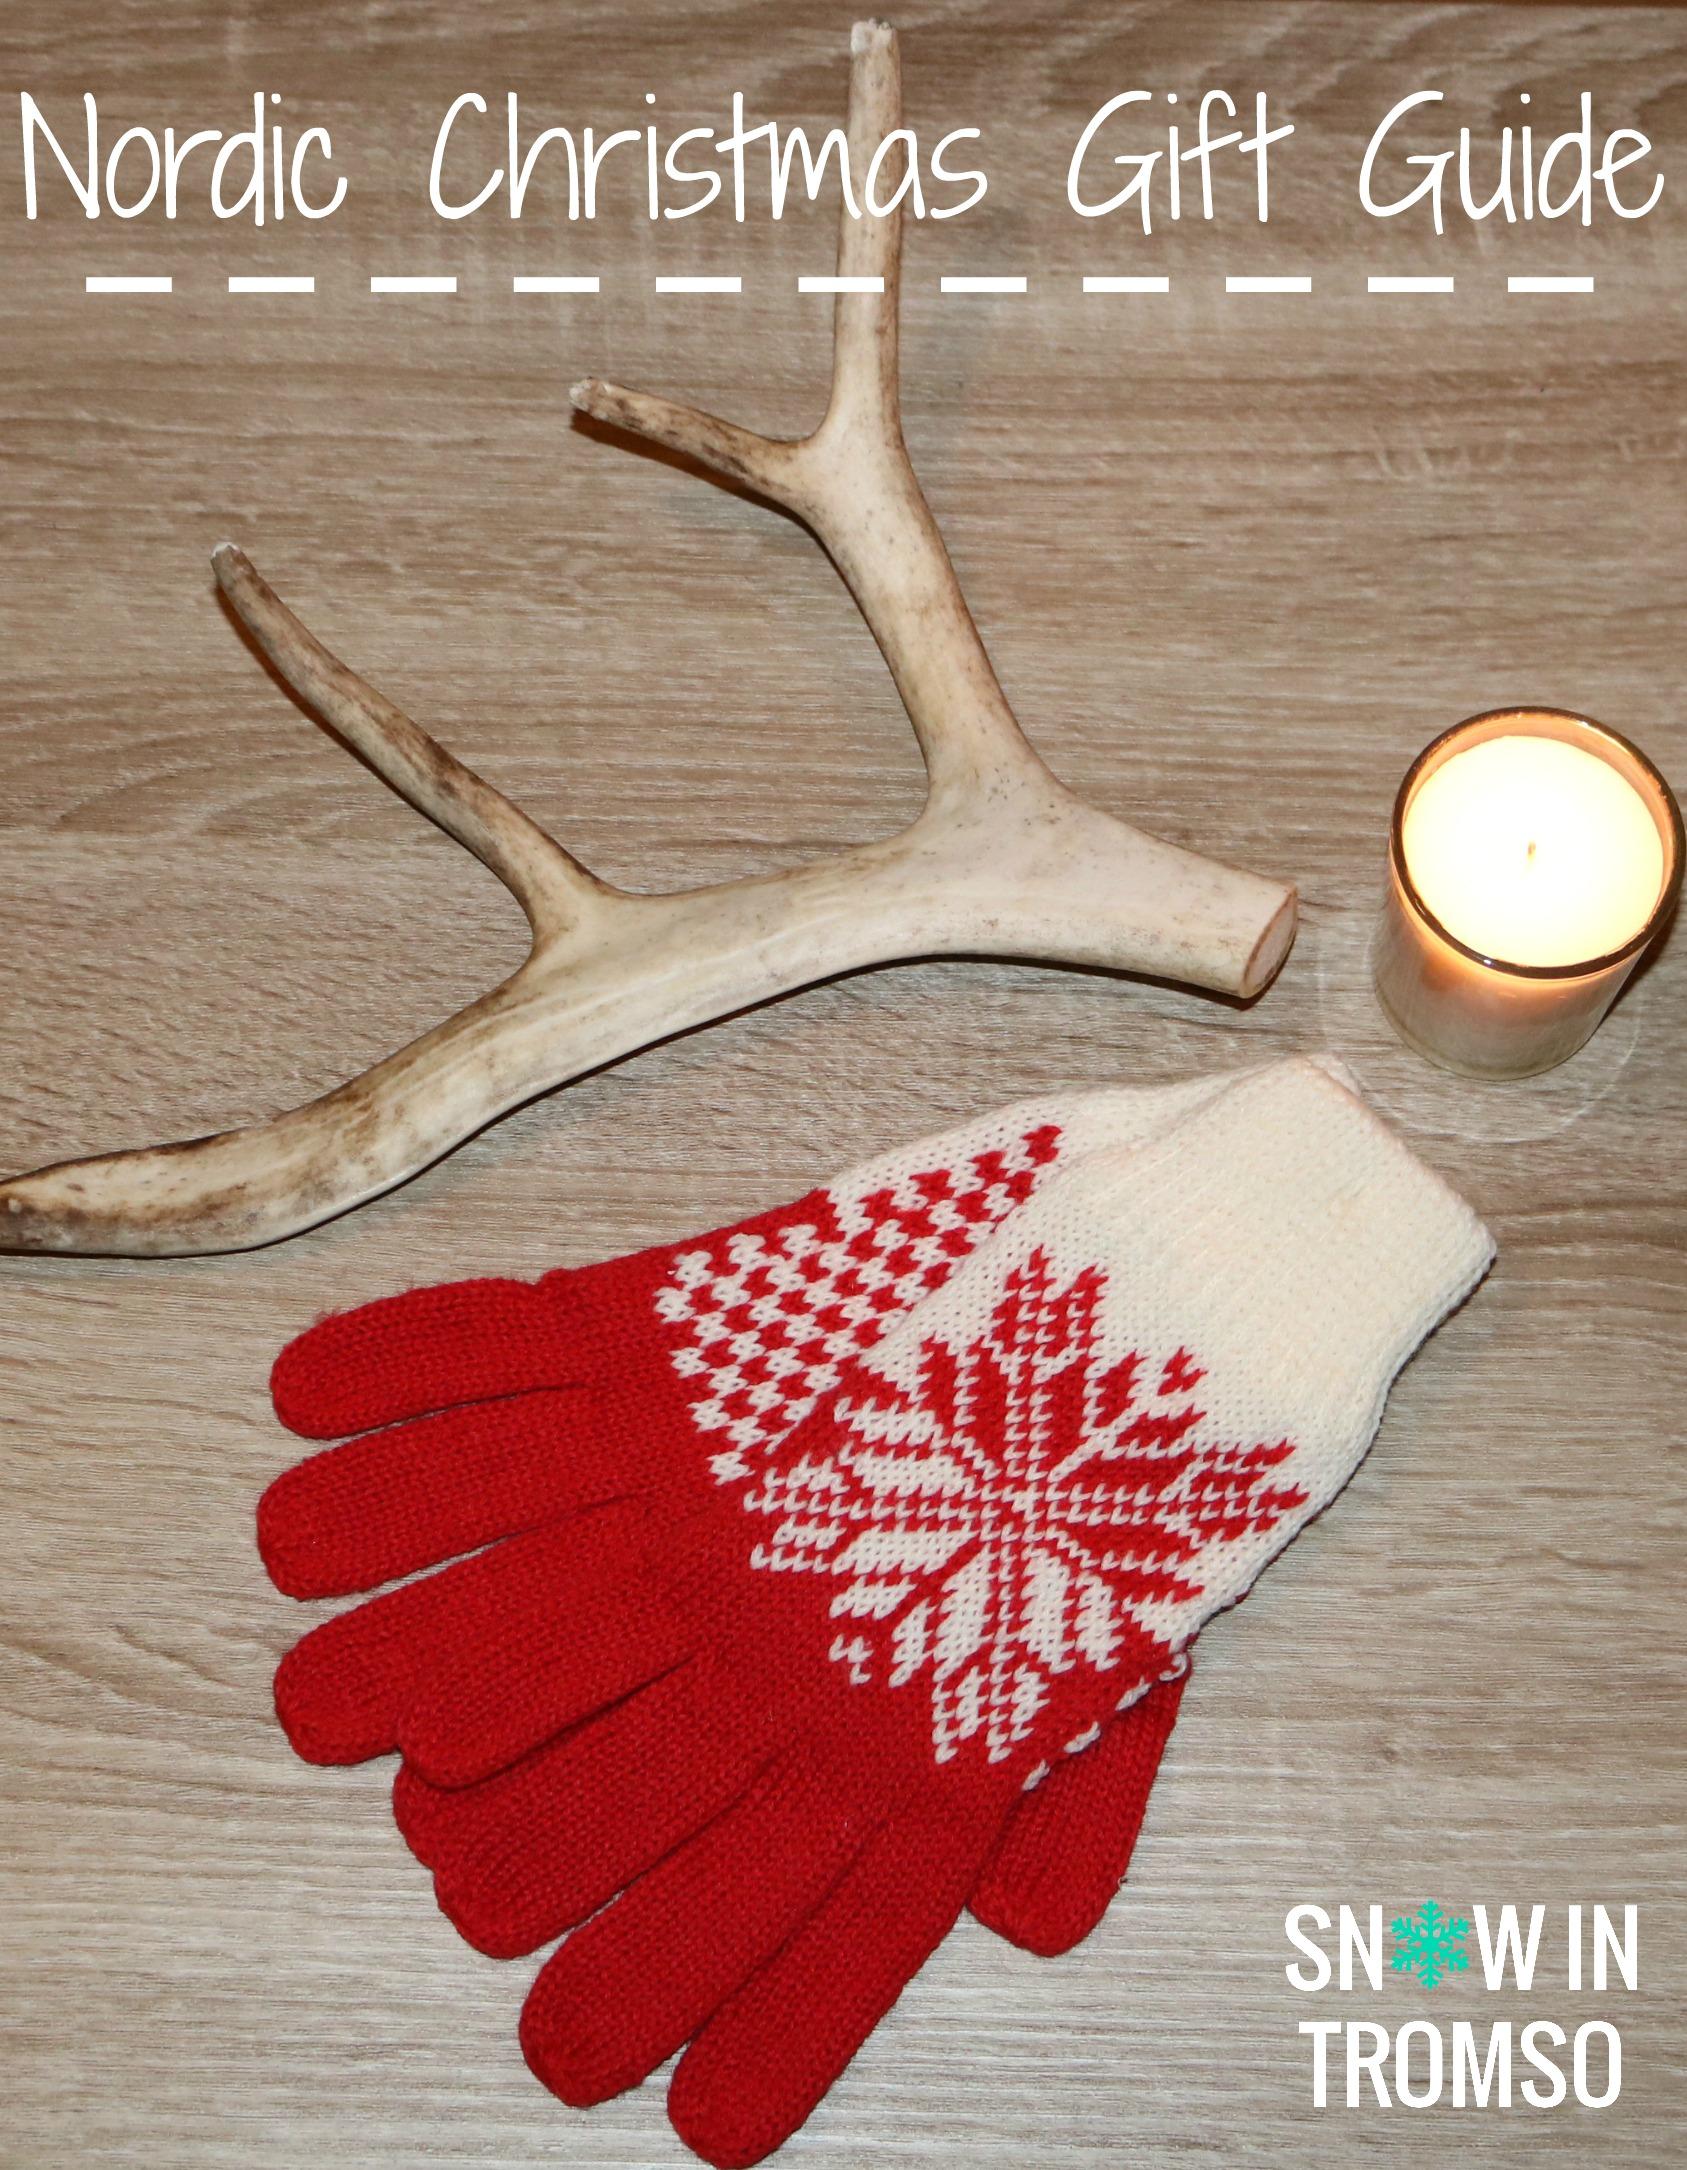 Nordic Christmas Gift Guide on Snow in Tromso.jpg